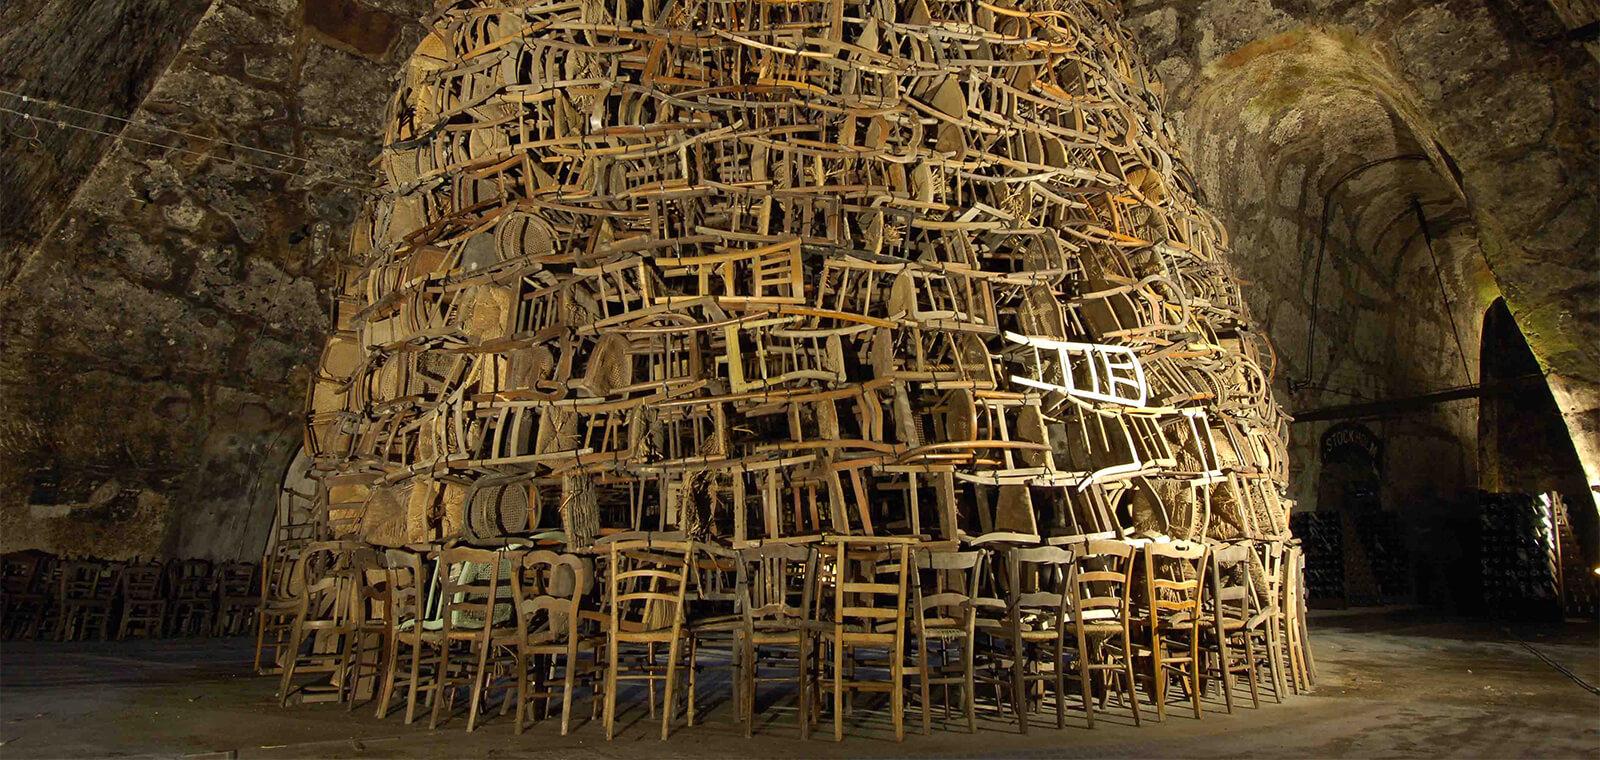 Tadashi Kawamata, Cathédrale des chaises, 2007